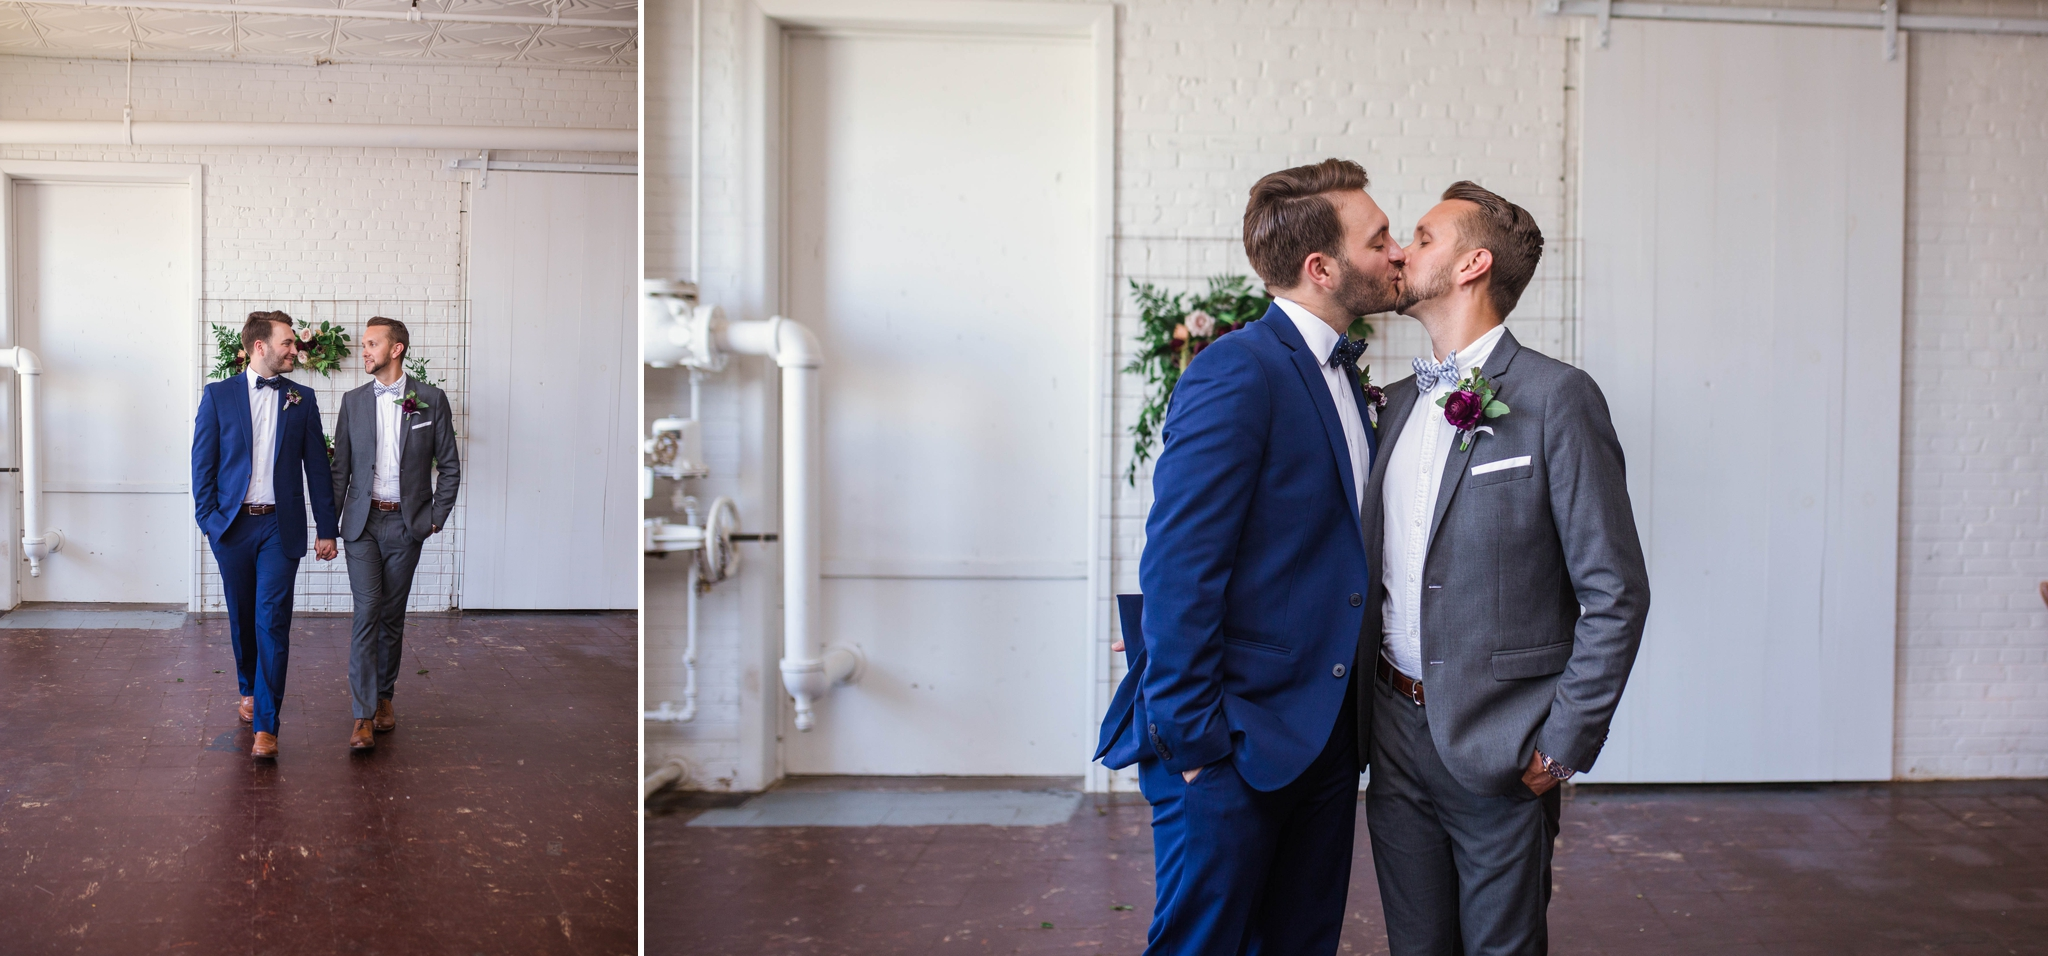 Gay and Lesbian friendly Wedding Photographer in Raleigh North Carolina - Johanna Dye Photography 11.jpg